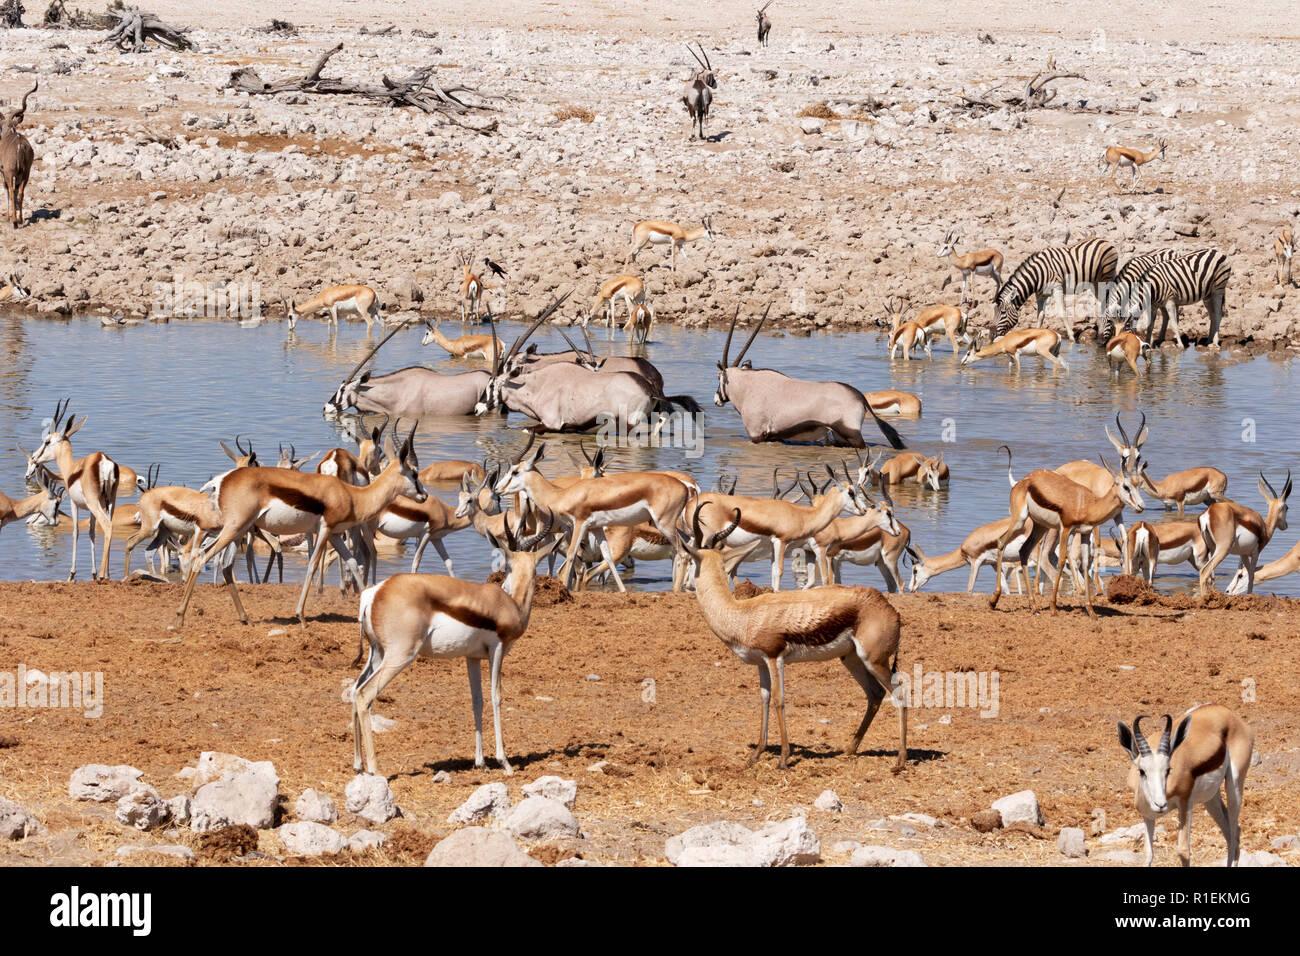 Namibia wildlife - herbivores around waterhole,including springbok,  zebra, oryx and kudu Okaukuejo camp, Etosha national park, Namibia Africa - Stock Image